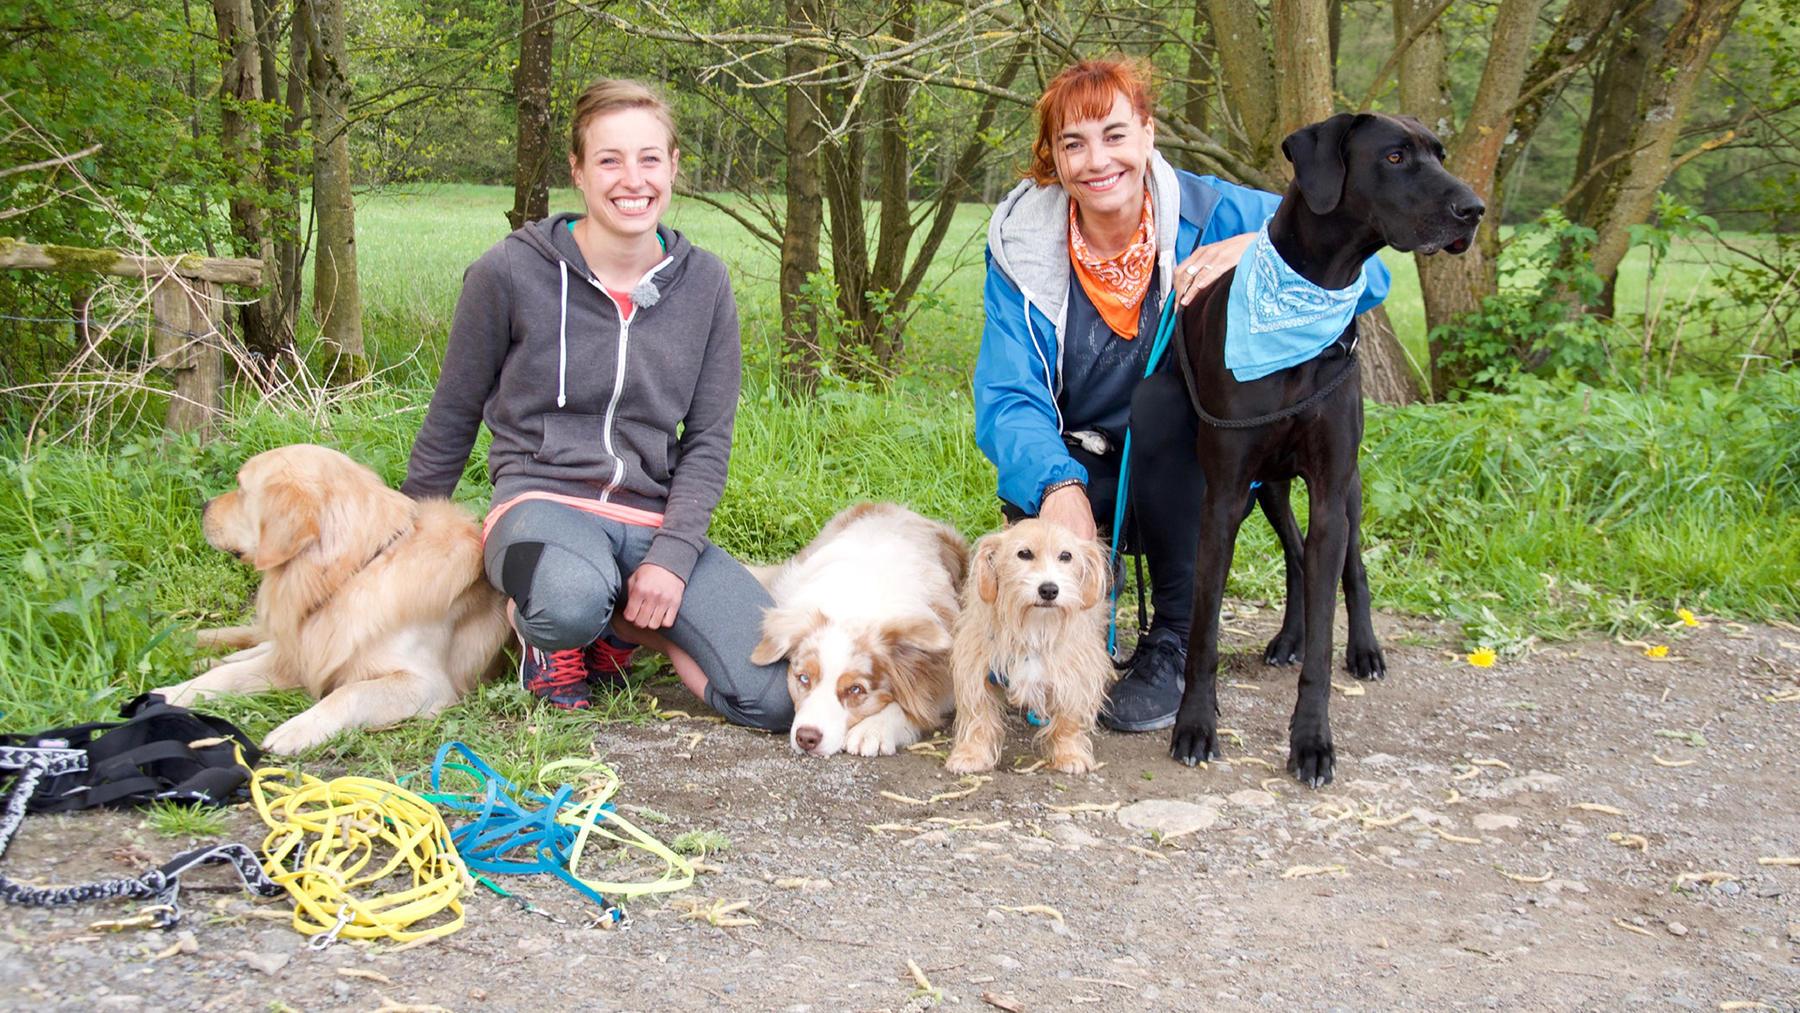 Thema heute u.a.: Joggen mit Hund